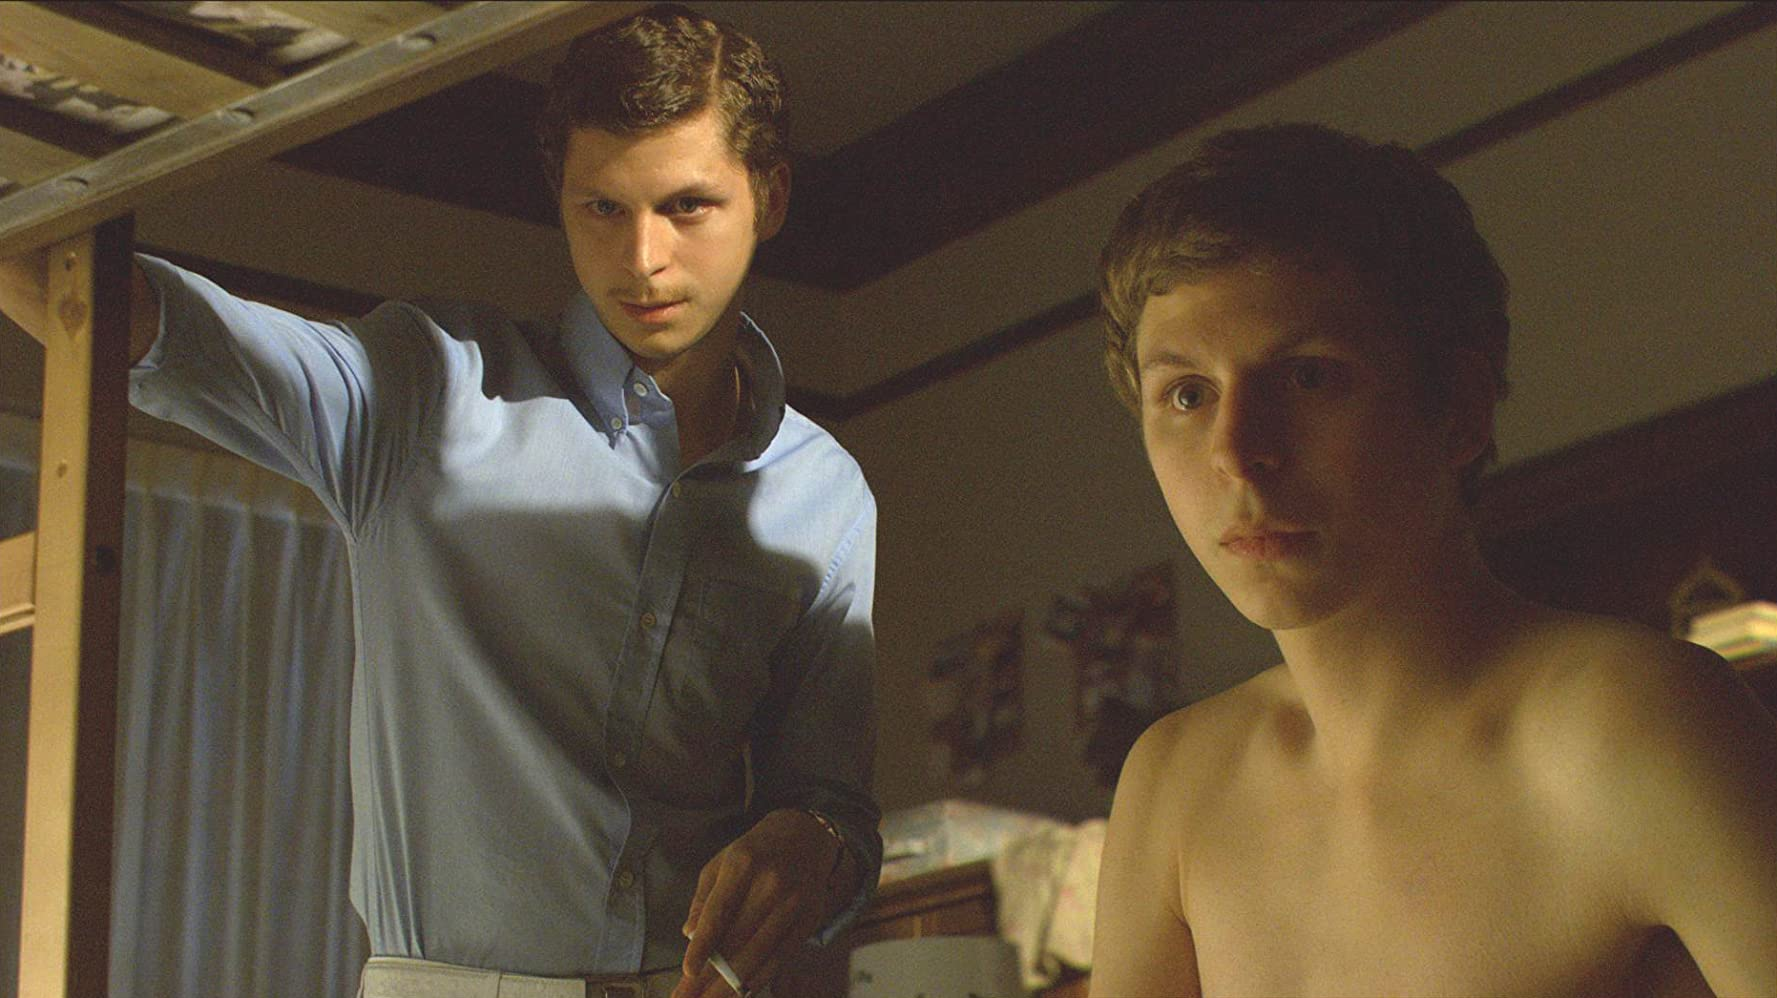 Michael Cera in Youth in Revolt (2009)